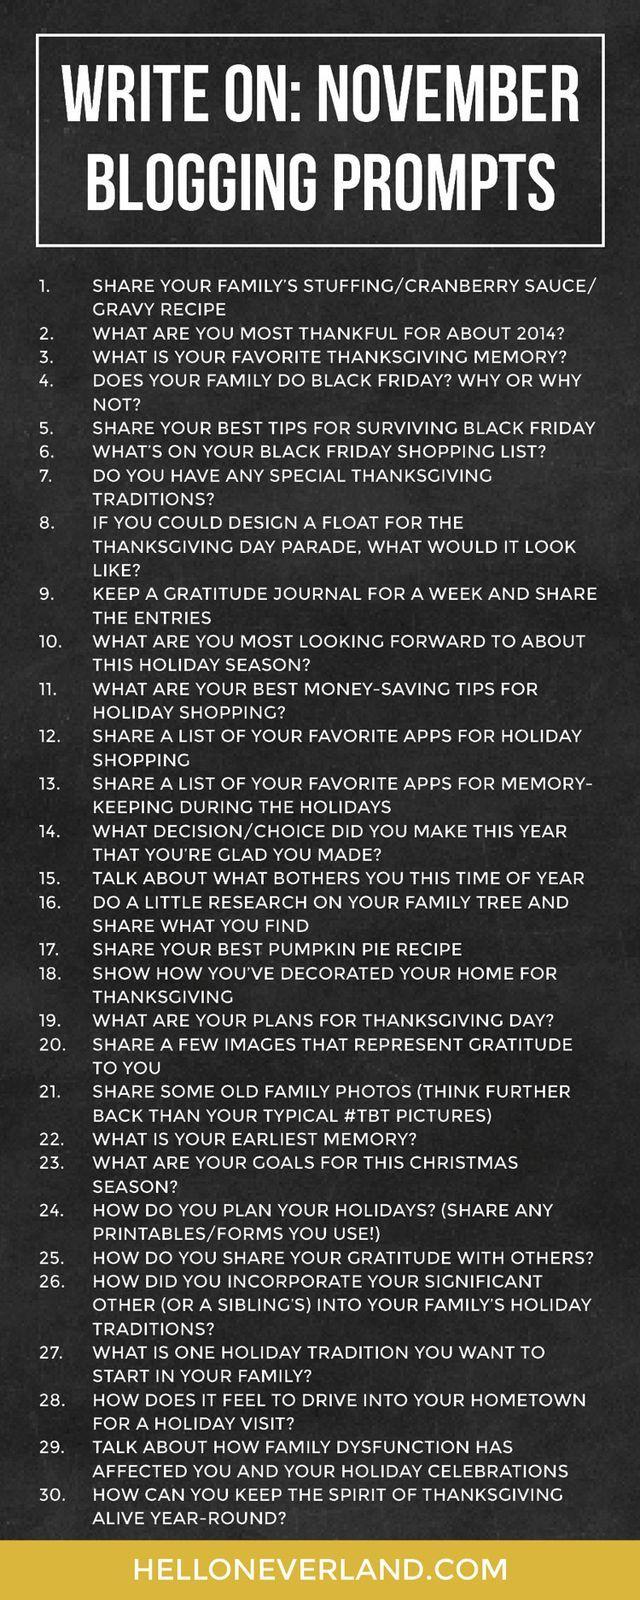 Write on: November blogging prompts (via Bloglovin.com )